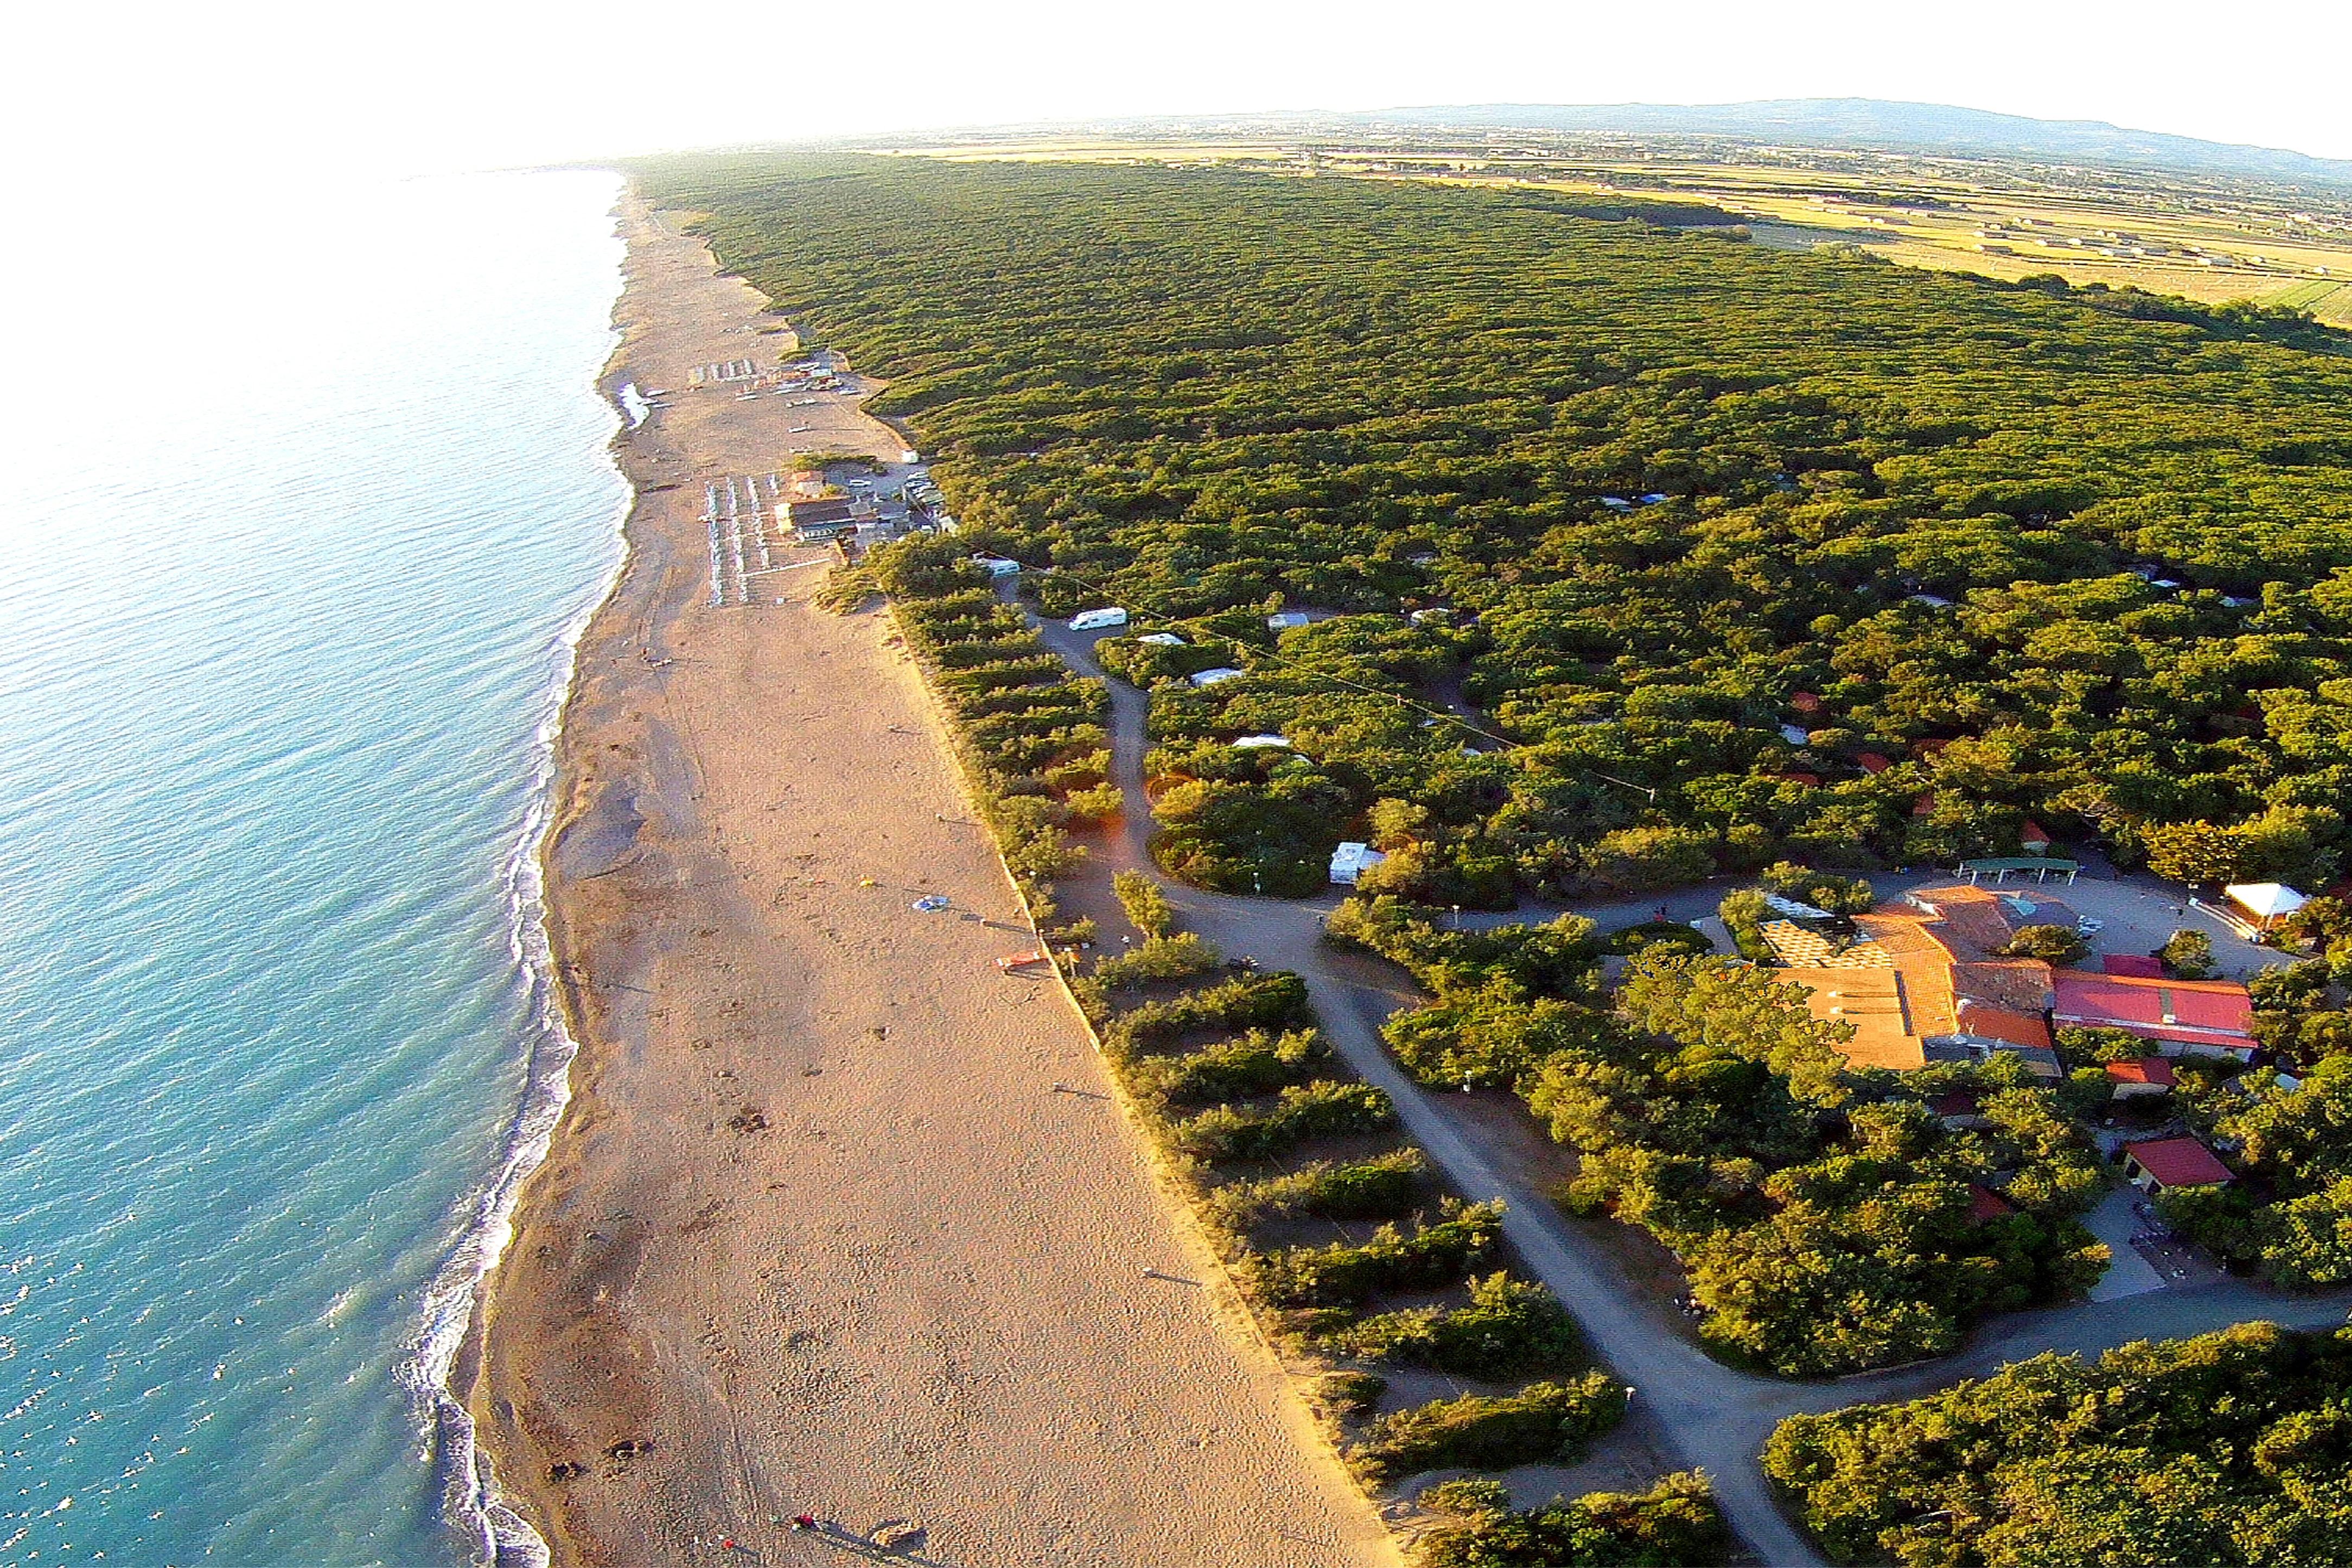 Karte Toskana Küste.Camping Toskana Alle Plätze Auf Einen Blick Pincamp By Adac